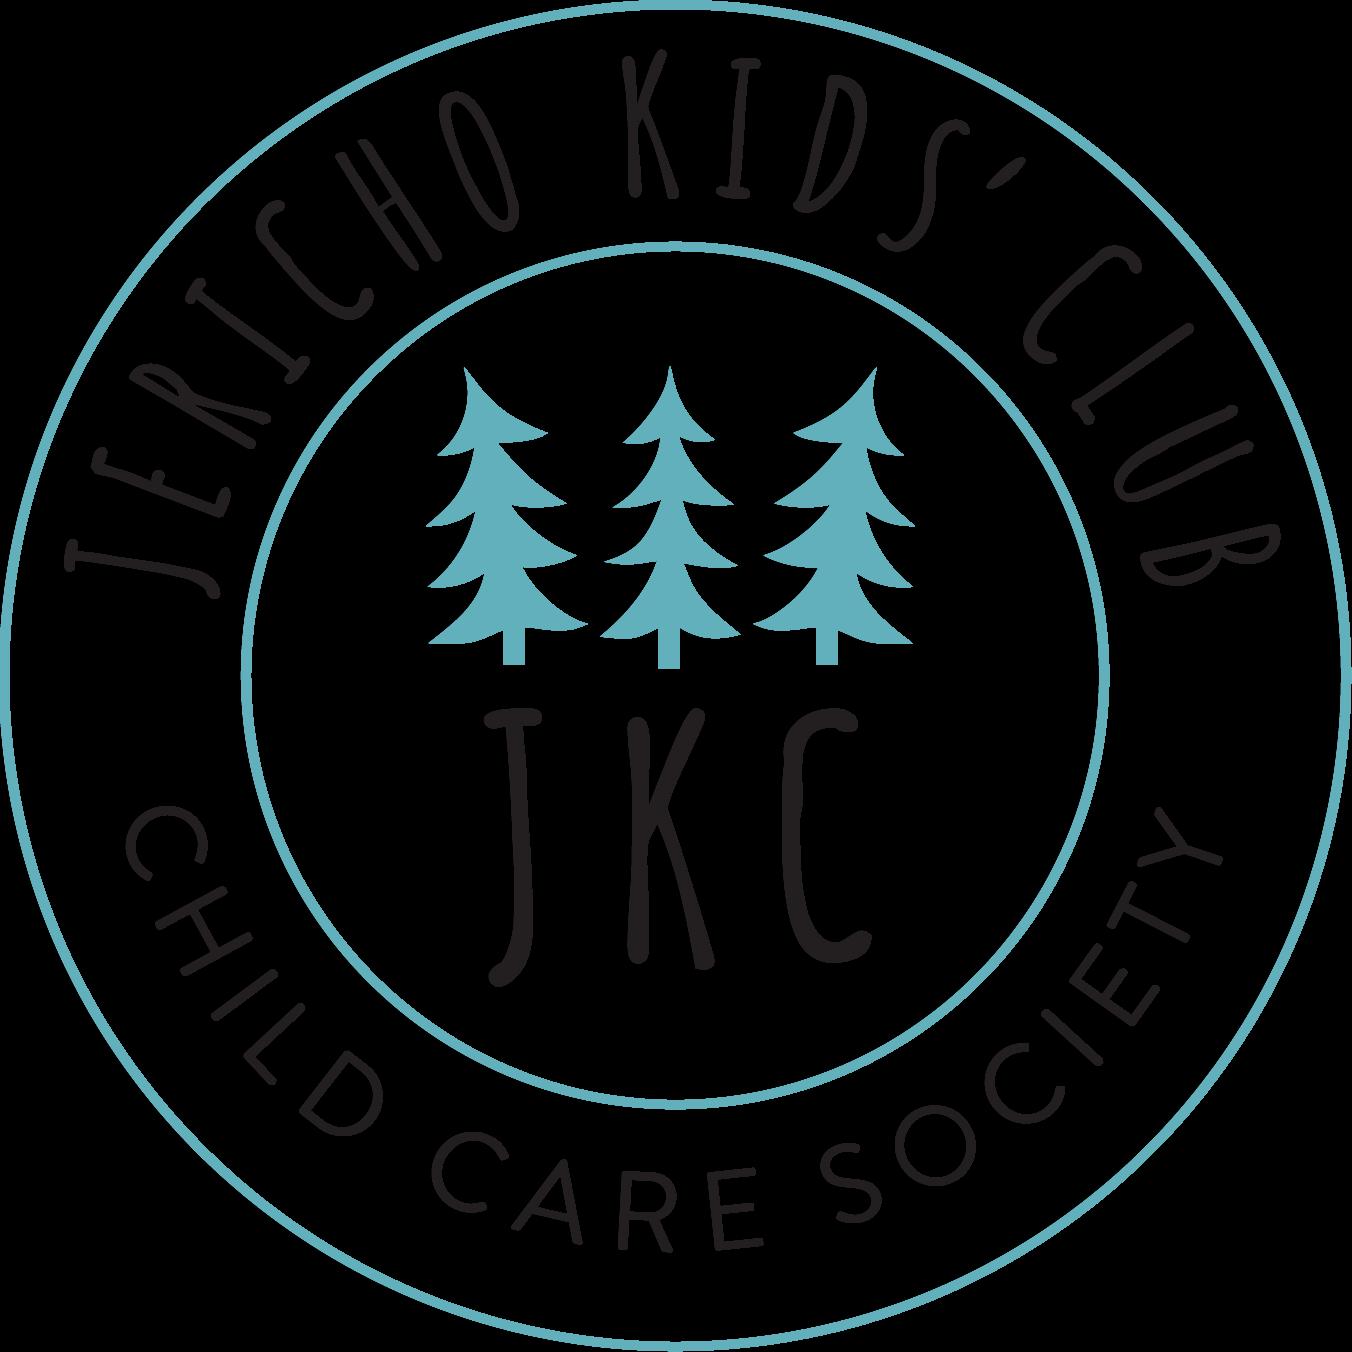 Jericho Kids Club Child Care Society